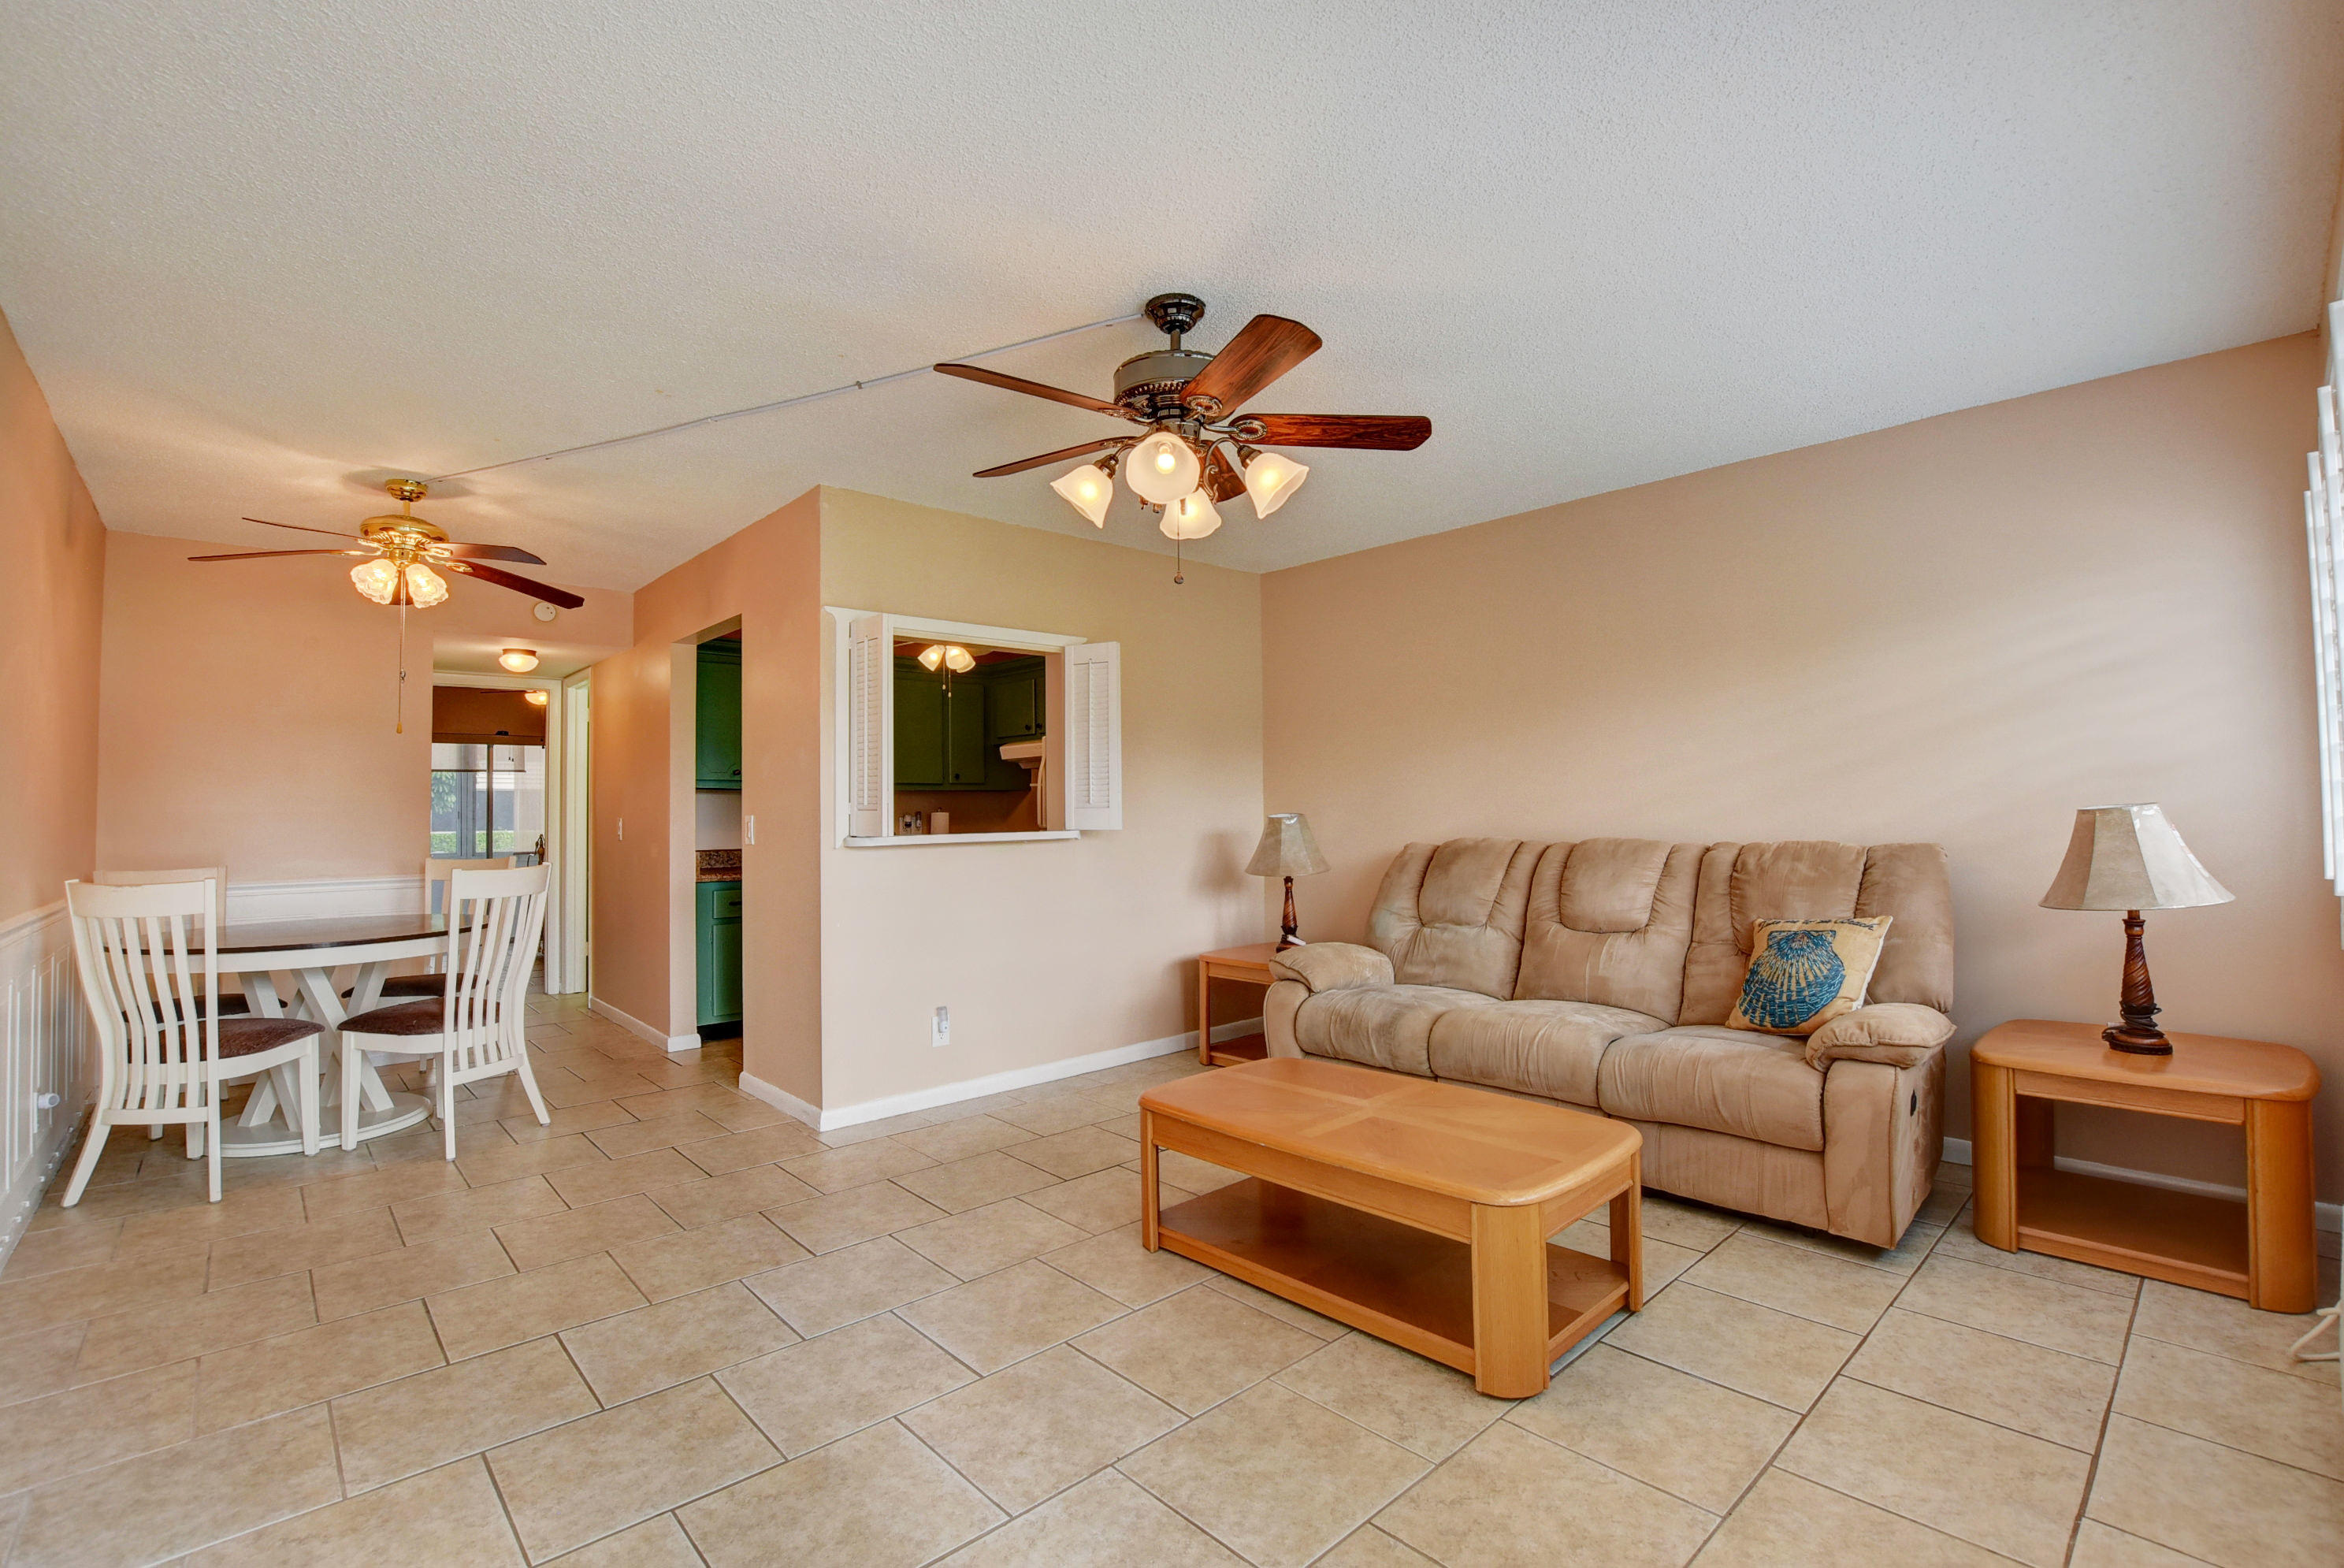 102 Cambridge E, West Palm Beach, FL 33417